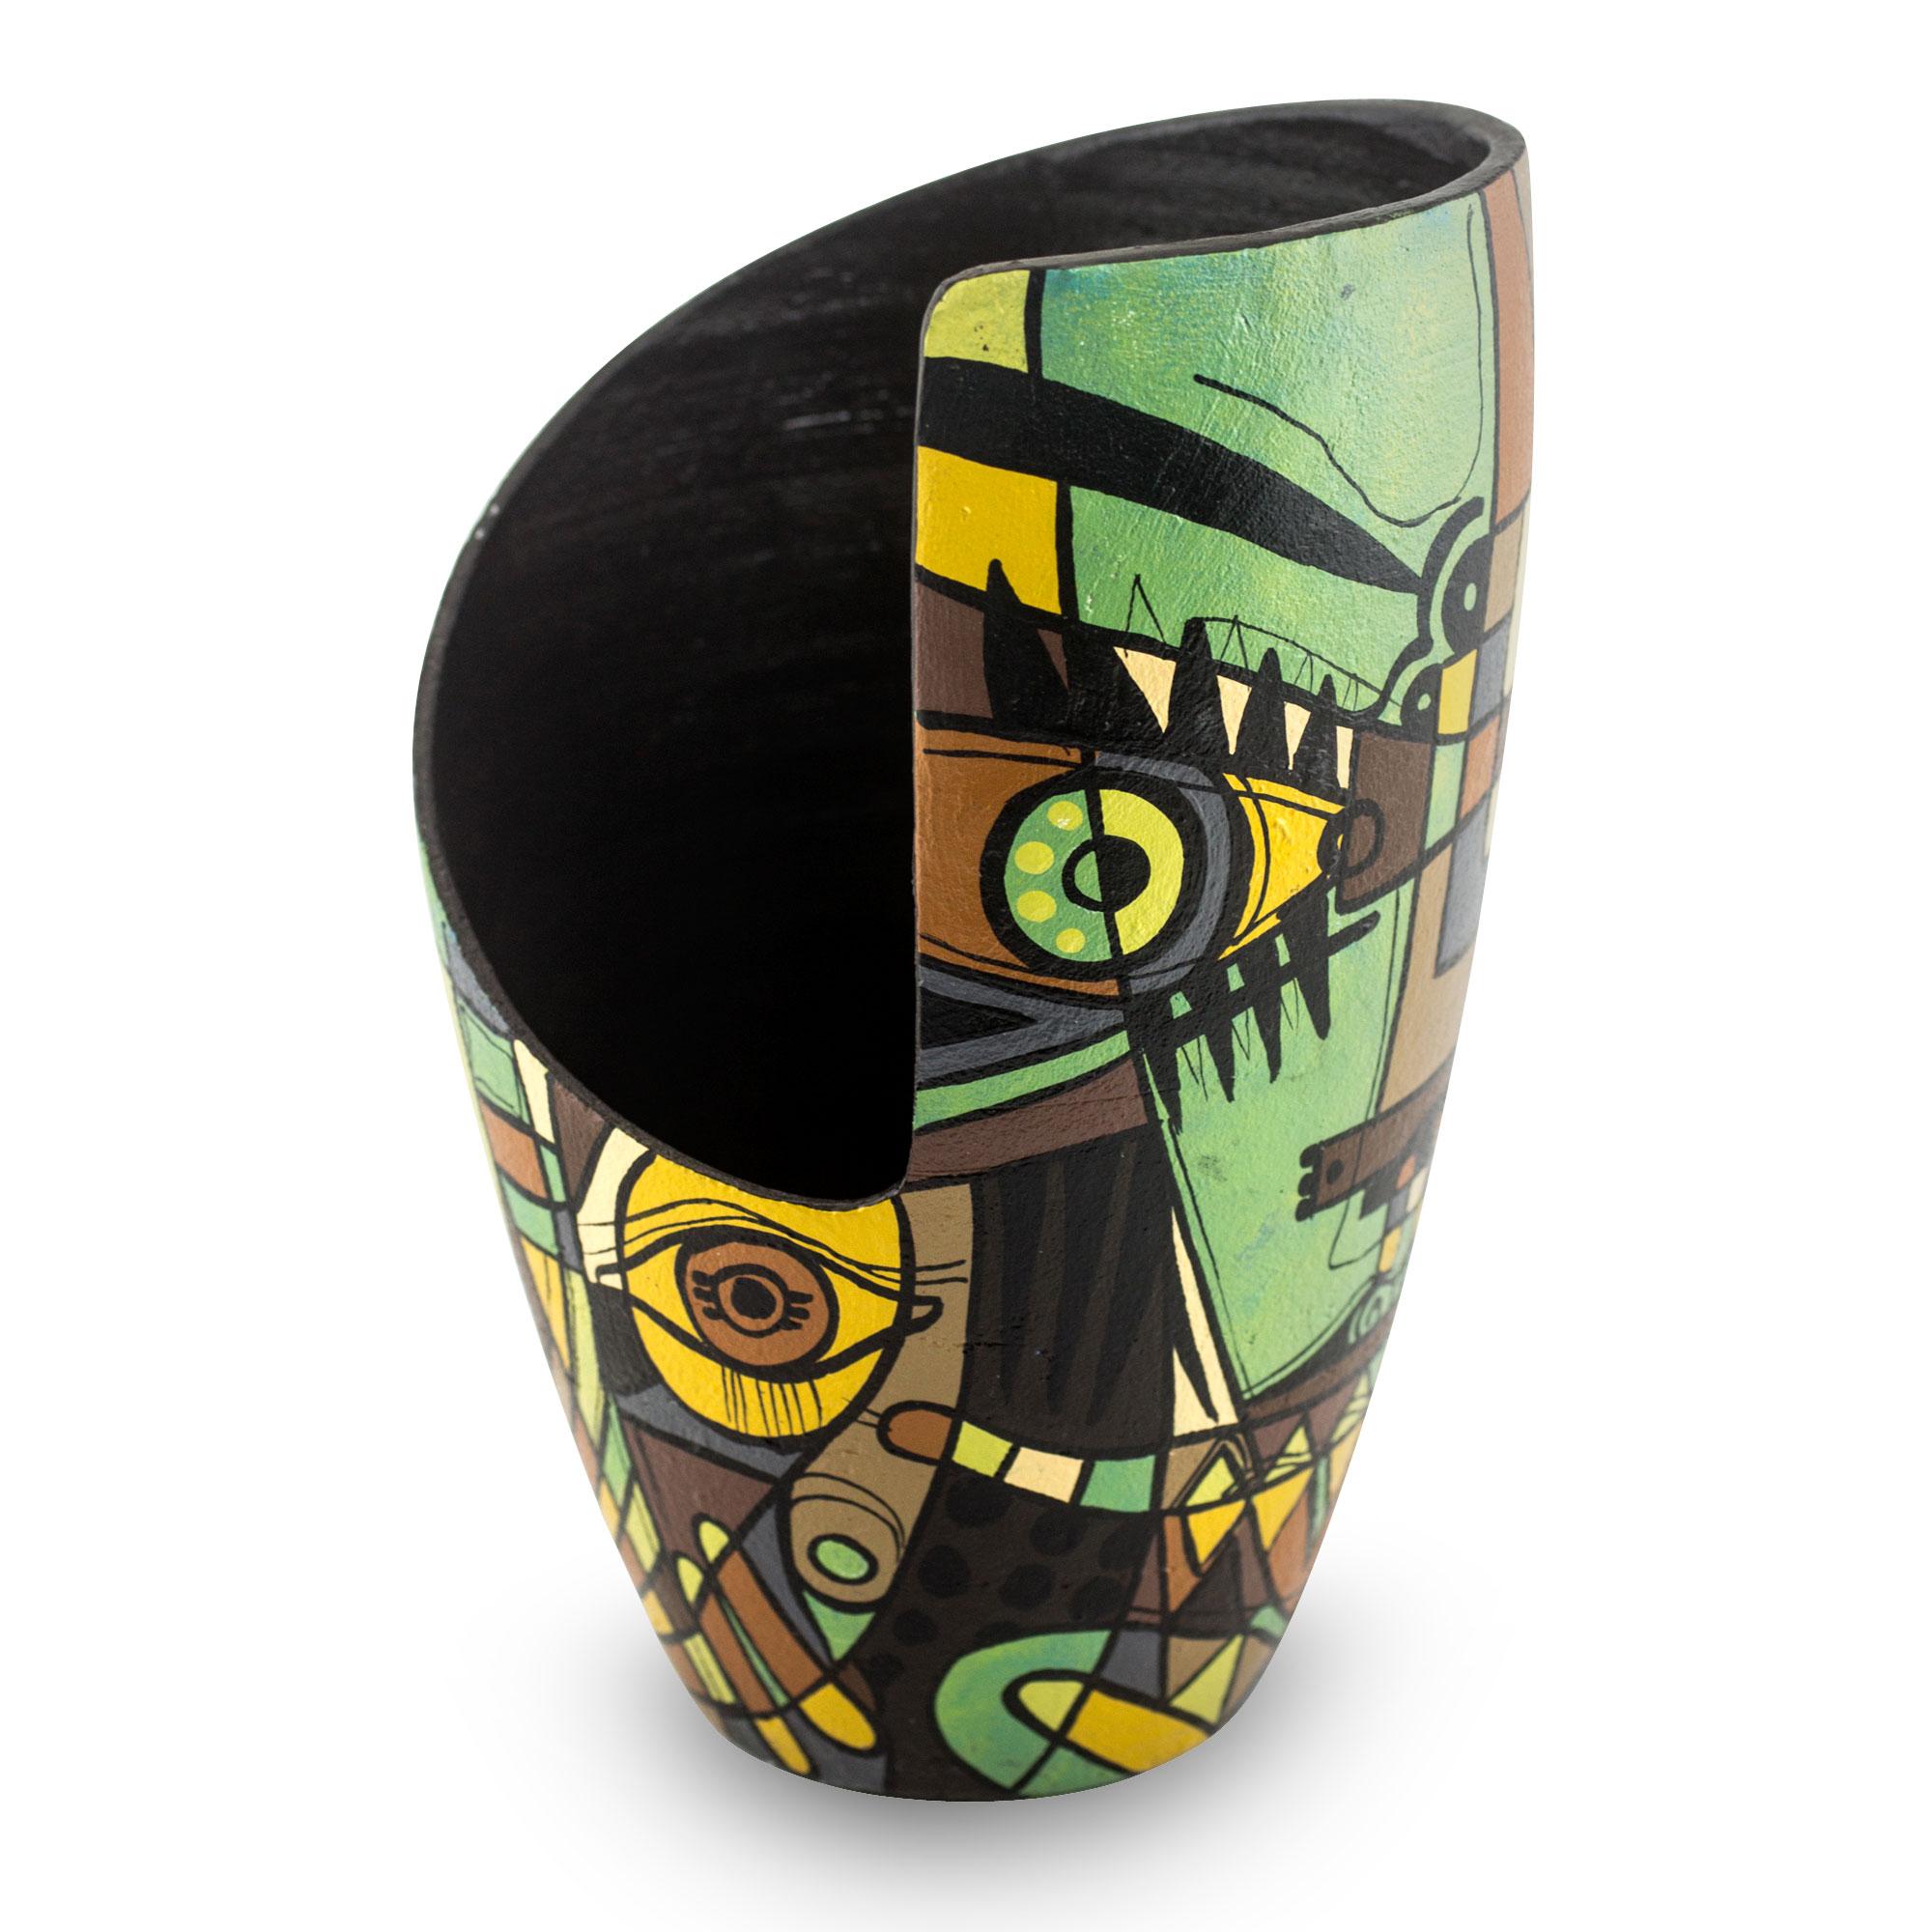 Decorative ceramic vase with hand painted abstract art abstract decorative ceramic vase with hand painted abstract art abstract glance novica reviewsmspy